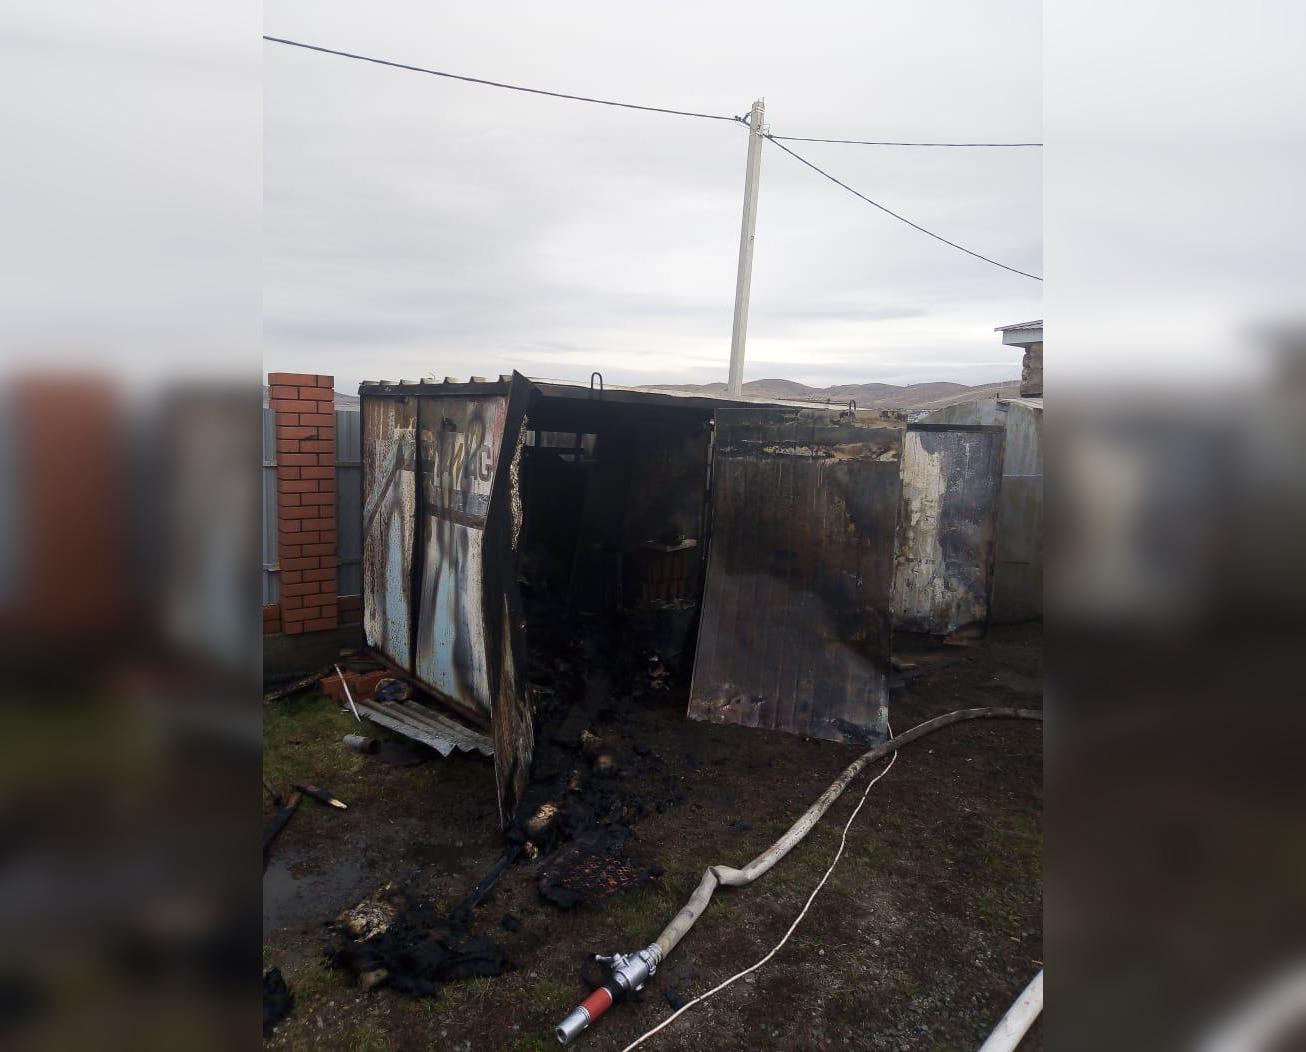 В Башкирии при пожаре на территории строящегося дома погибли трое мужчин